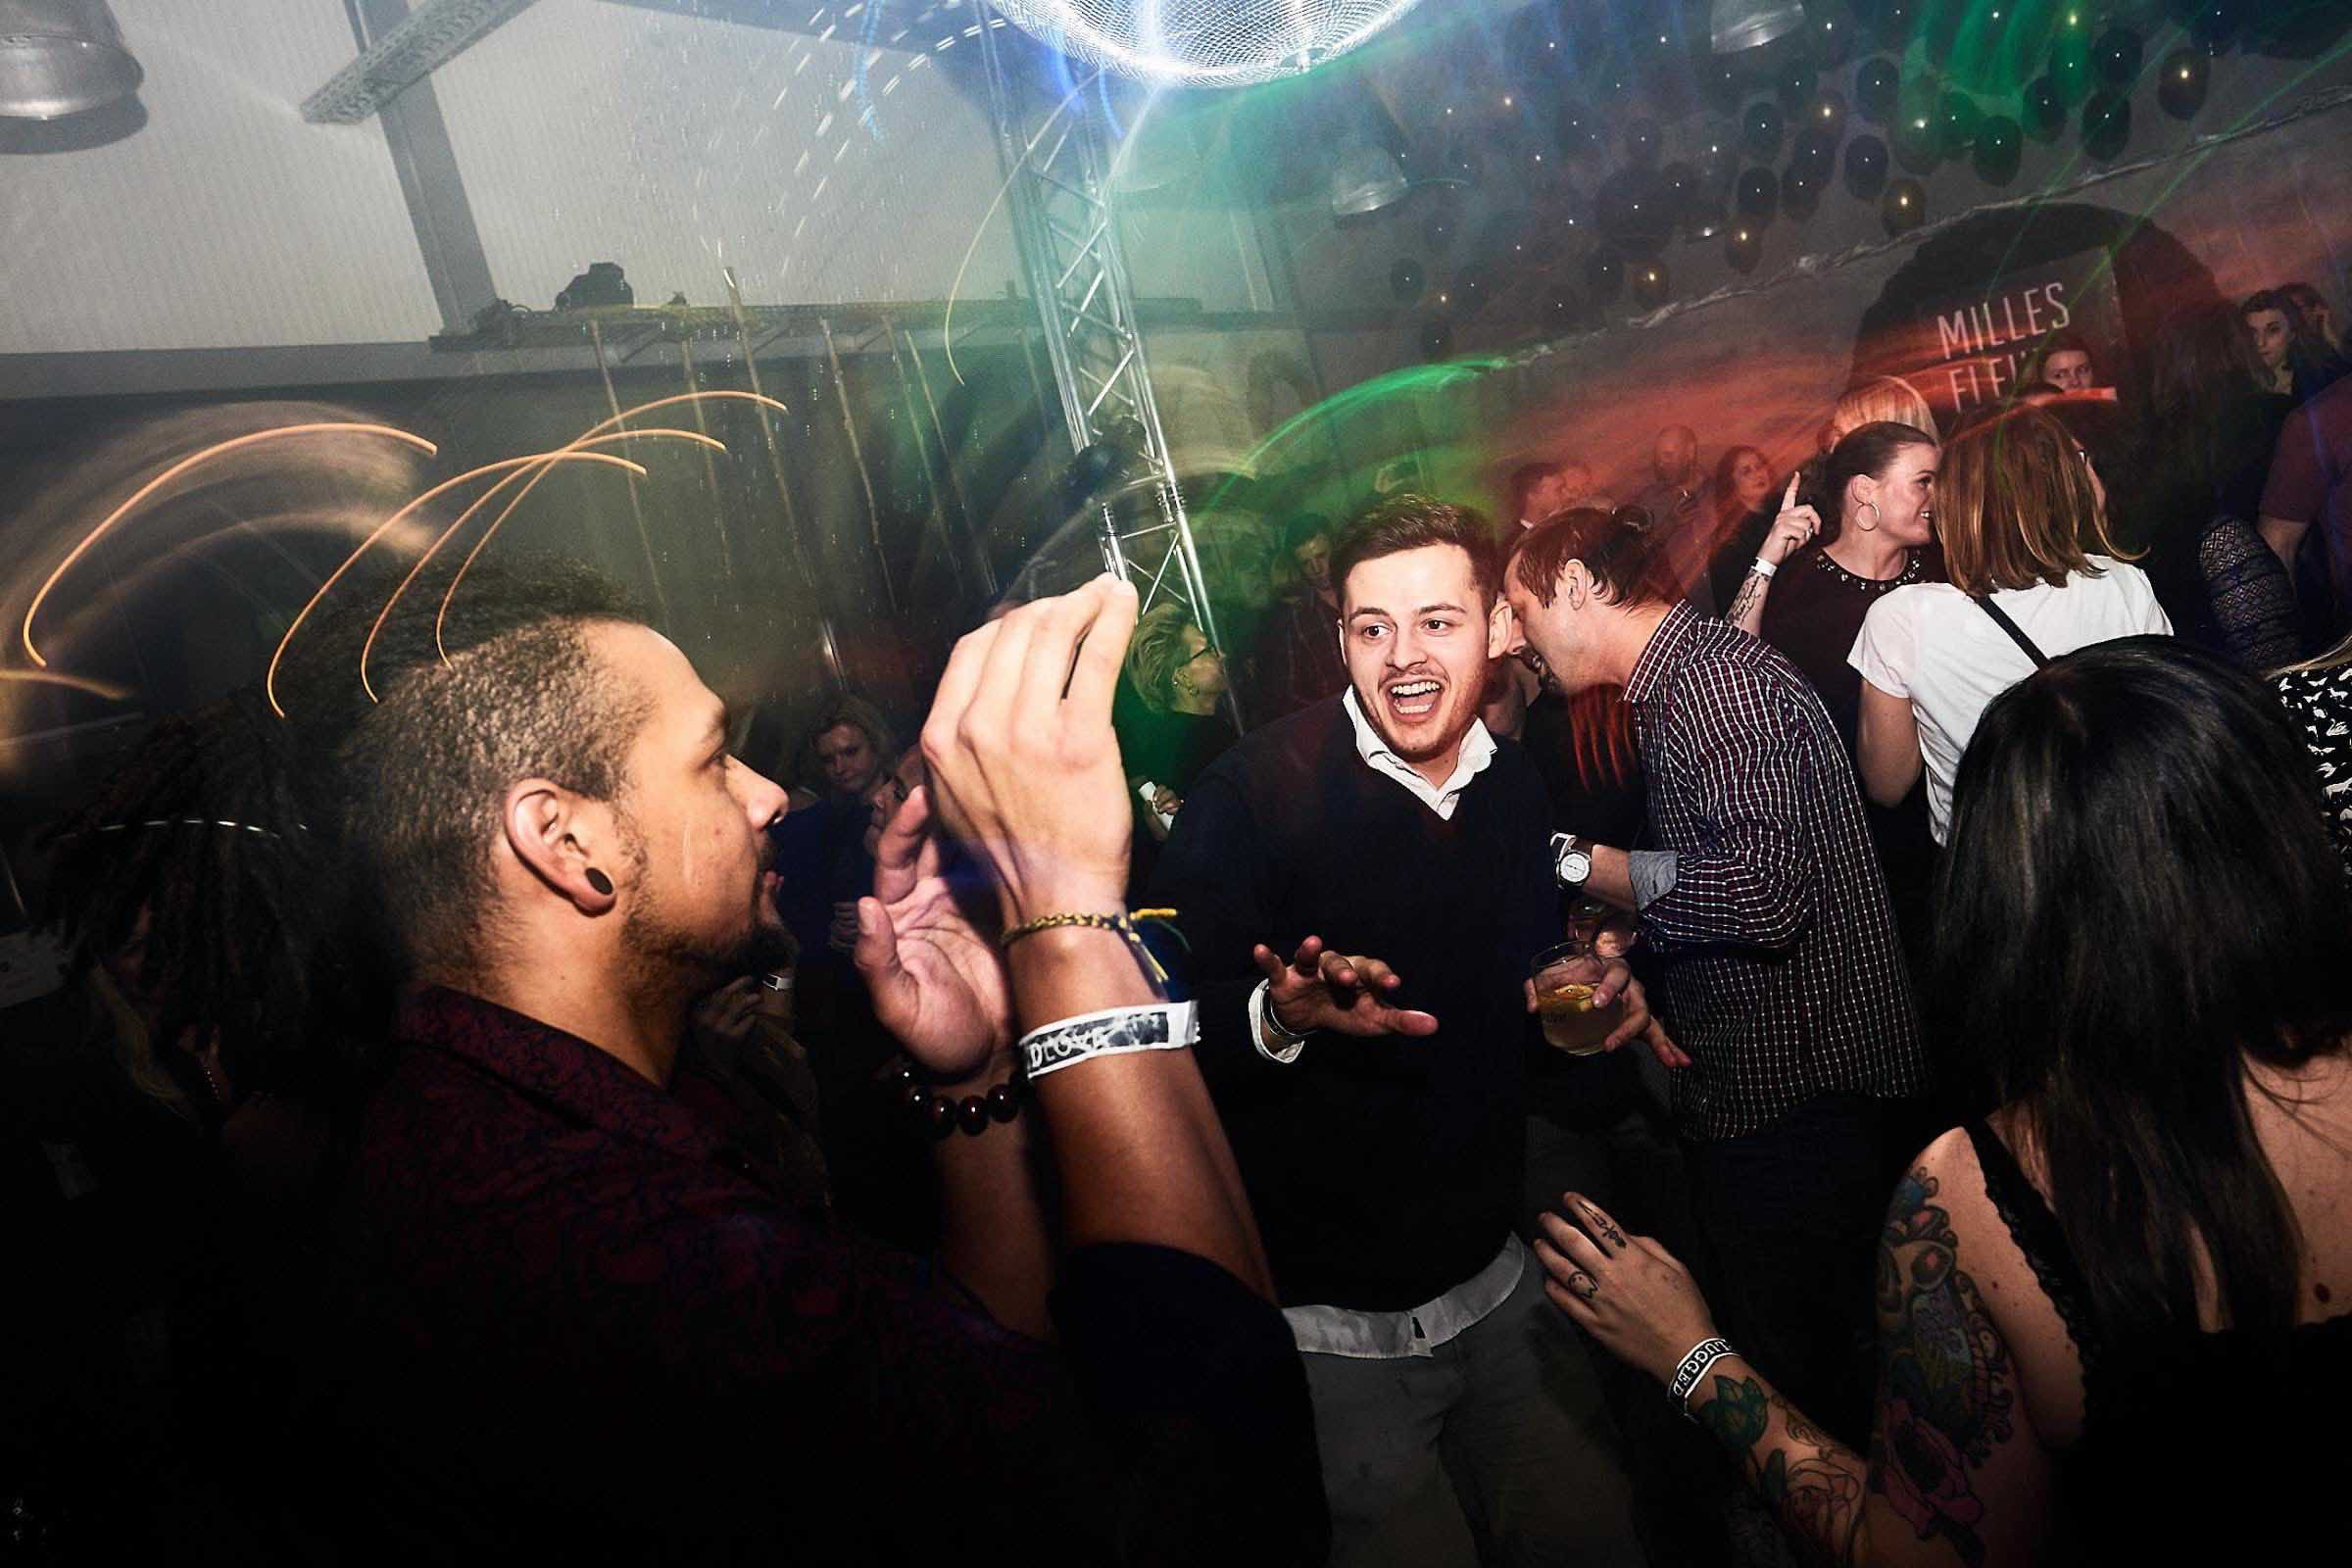 DJ   Geburtstag   DJ   Agentur   Hamburg   DJ   Messe   DJ   Firmenevent   Firmenfeier   DJ   Weihnachtsfeier   DJ   Sommerfest   DJ   Weihnachtsfeier   DJ   Party   Event   Buchen   Anfragen   Hamburgfeiert